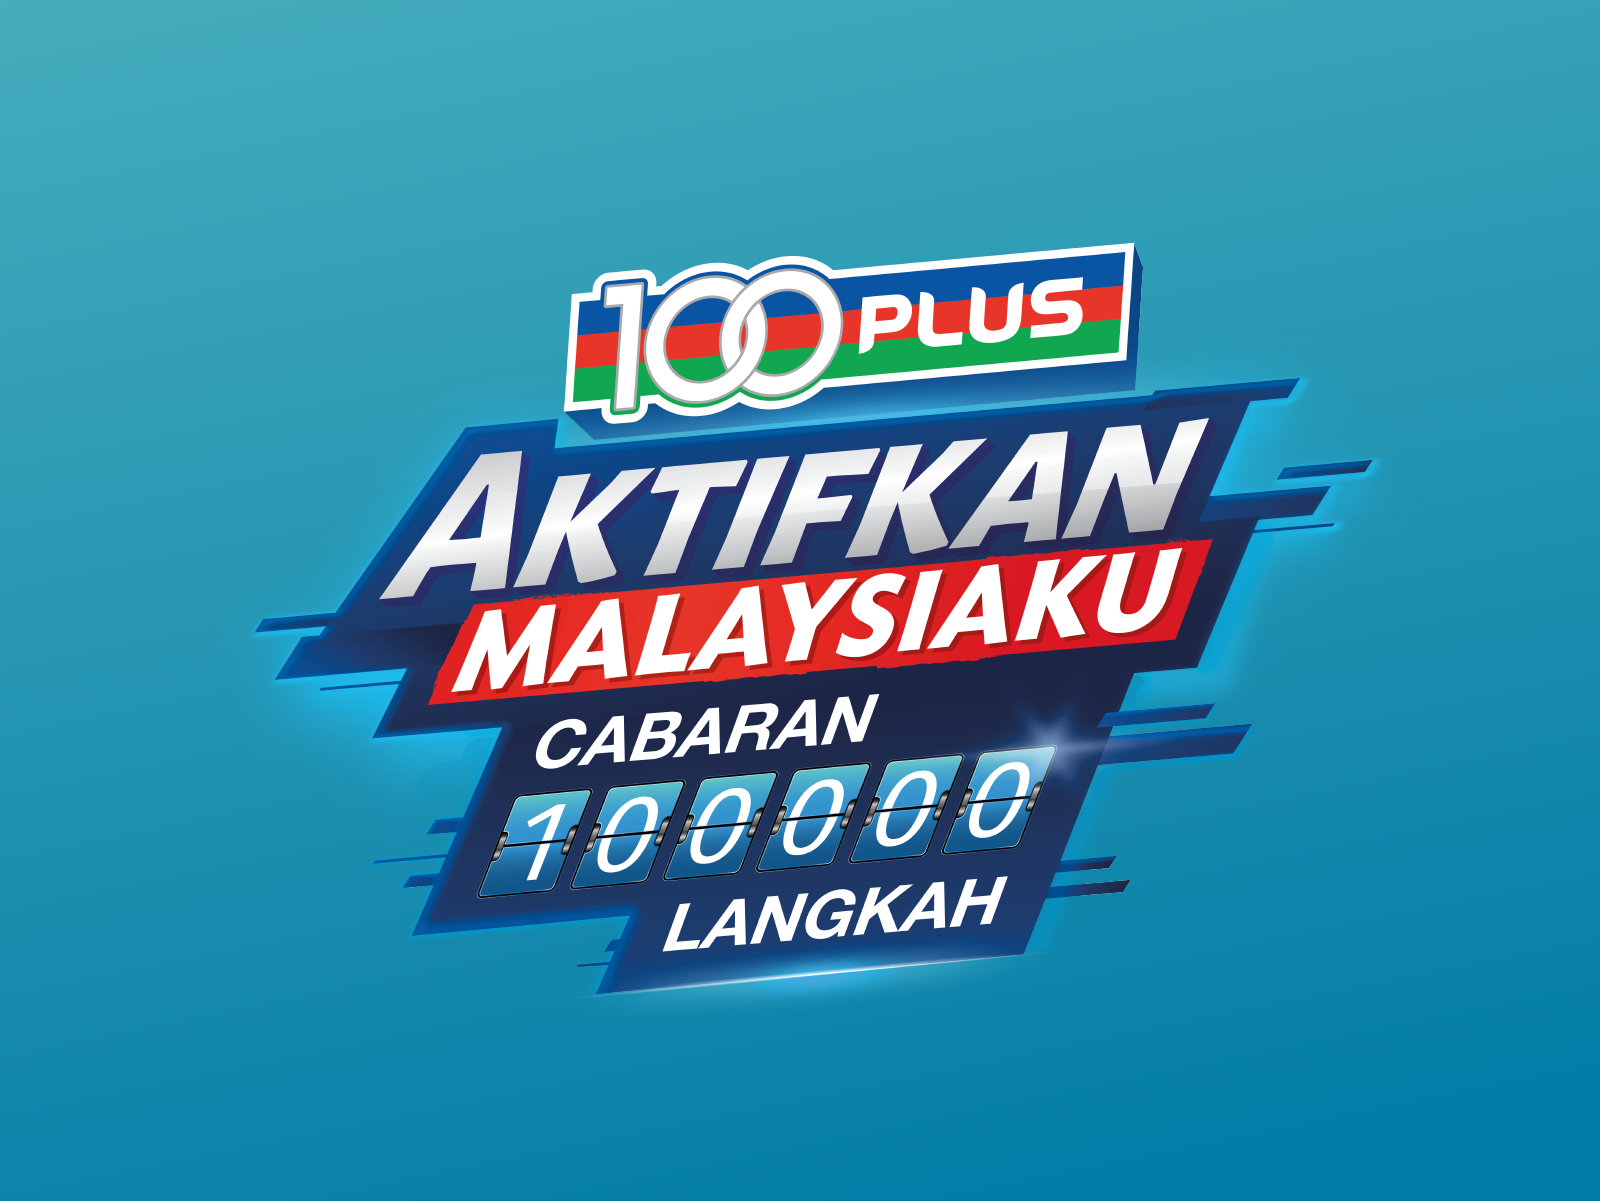 100Plus Aktifkan Malaysiaku 100,000 Steps Challenge campaign masthead design in bahasa Malaysia